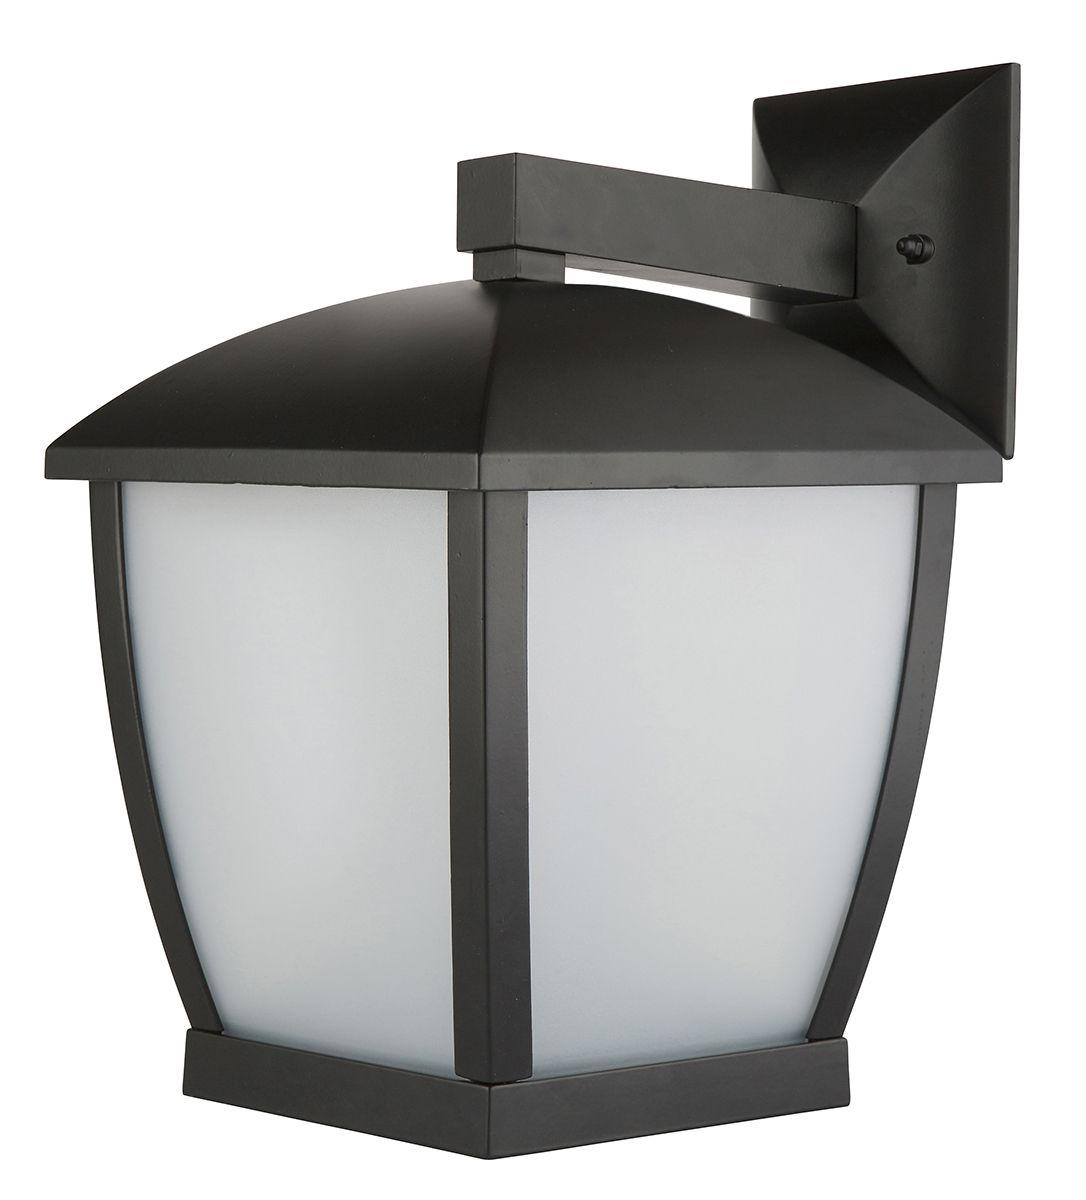 ashby modern coach wall light in black. ashby modern coach wall light in black  exterior coach lights